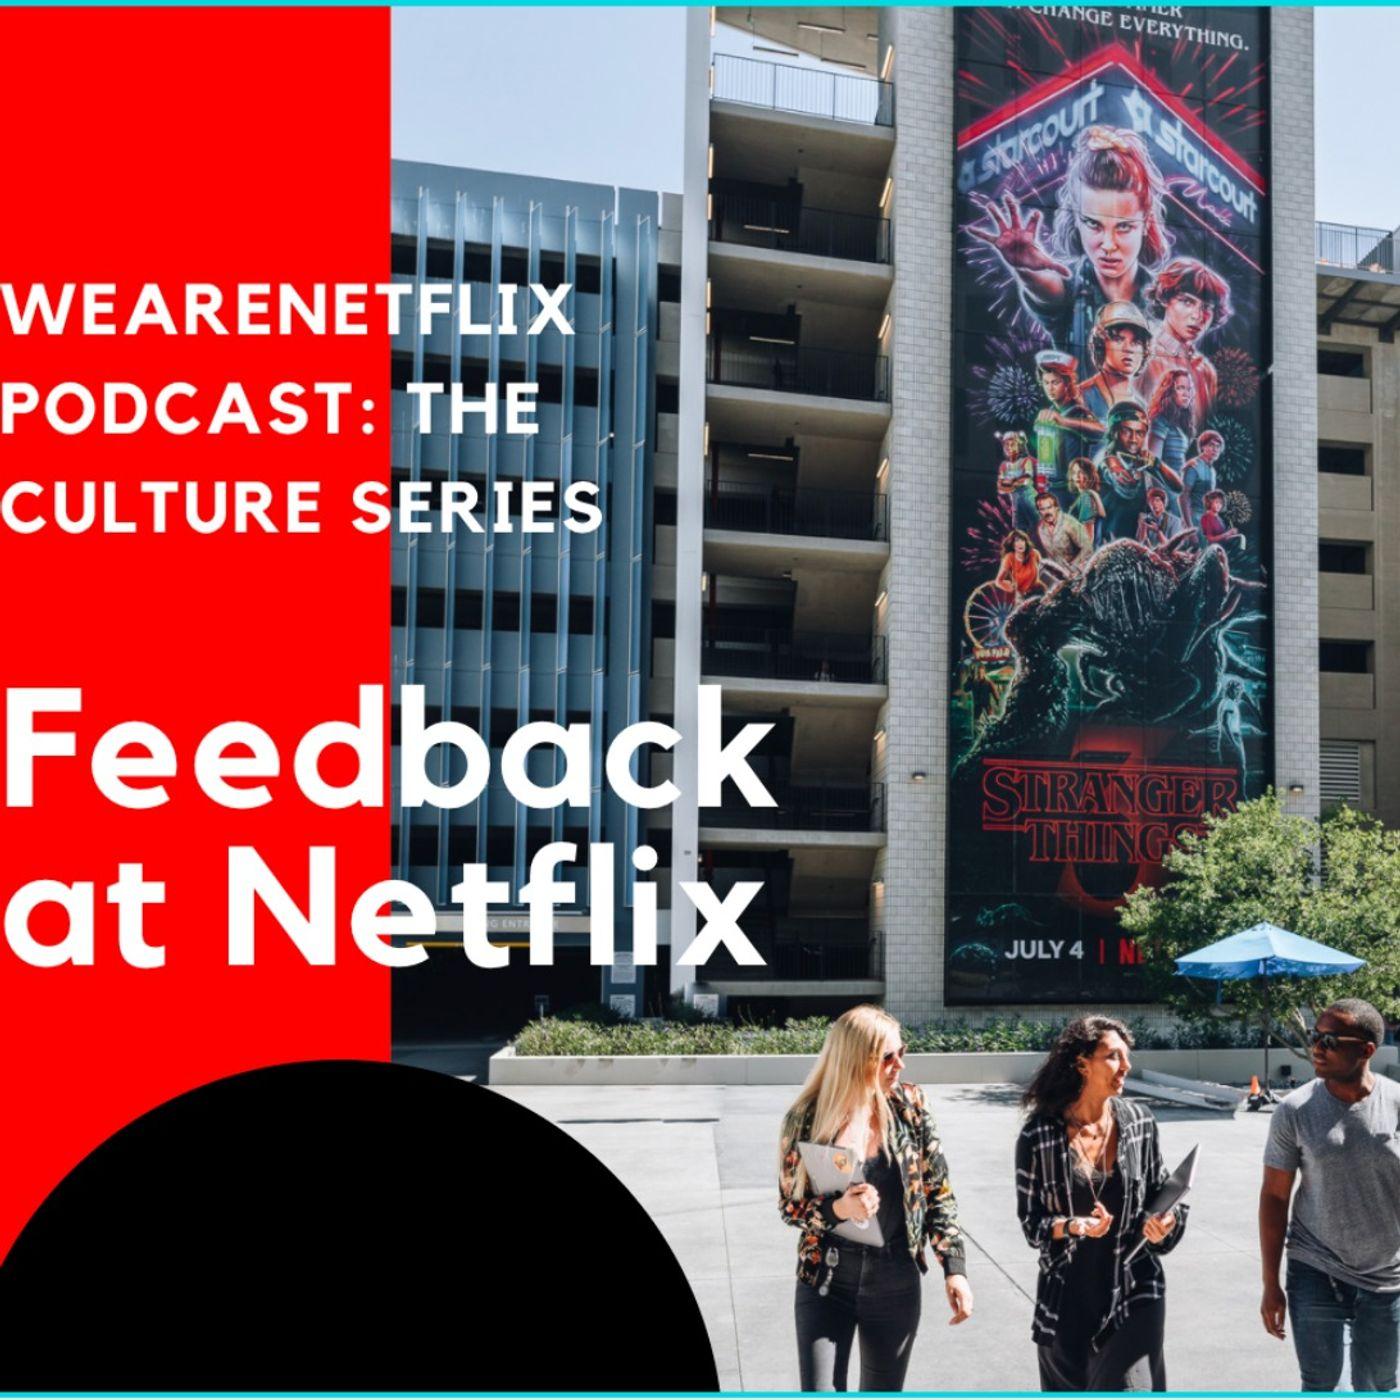 Netflix Culture: Feedback